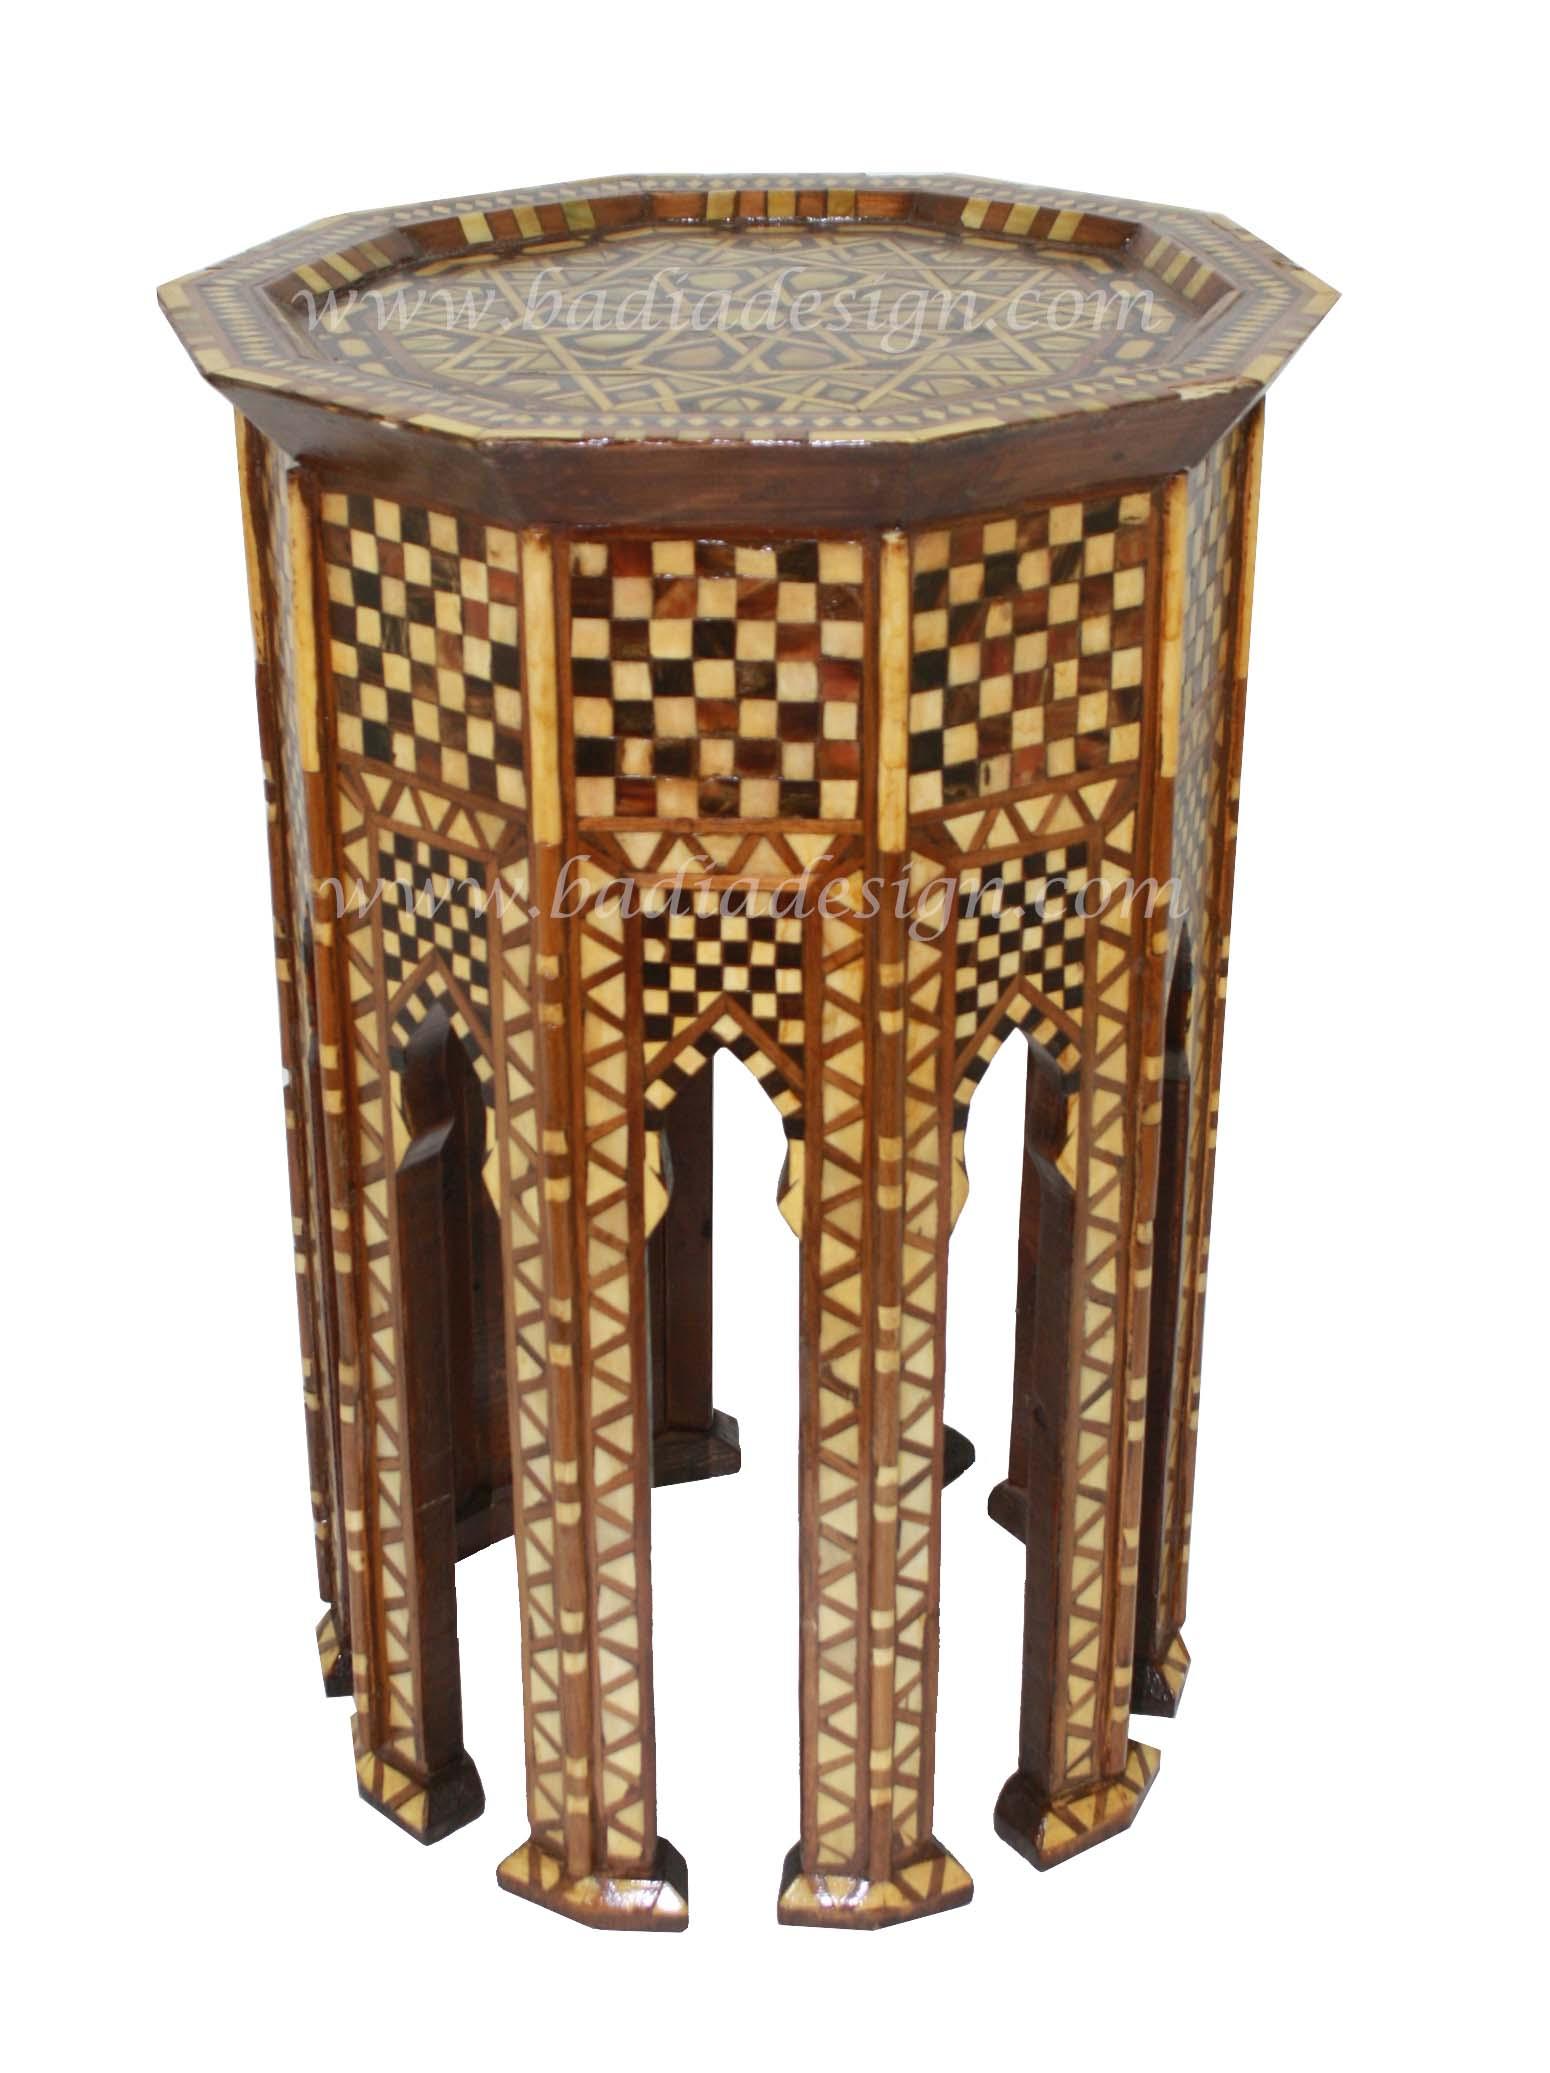 syrian-furniture-los-angeles-mop-st076-1.jpg